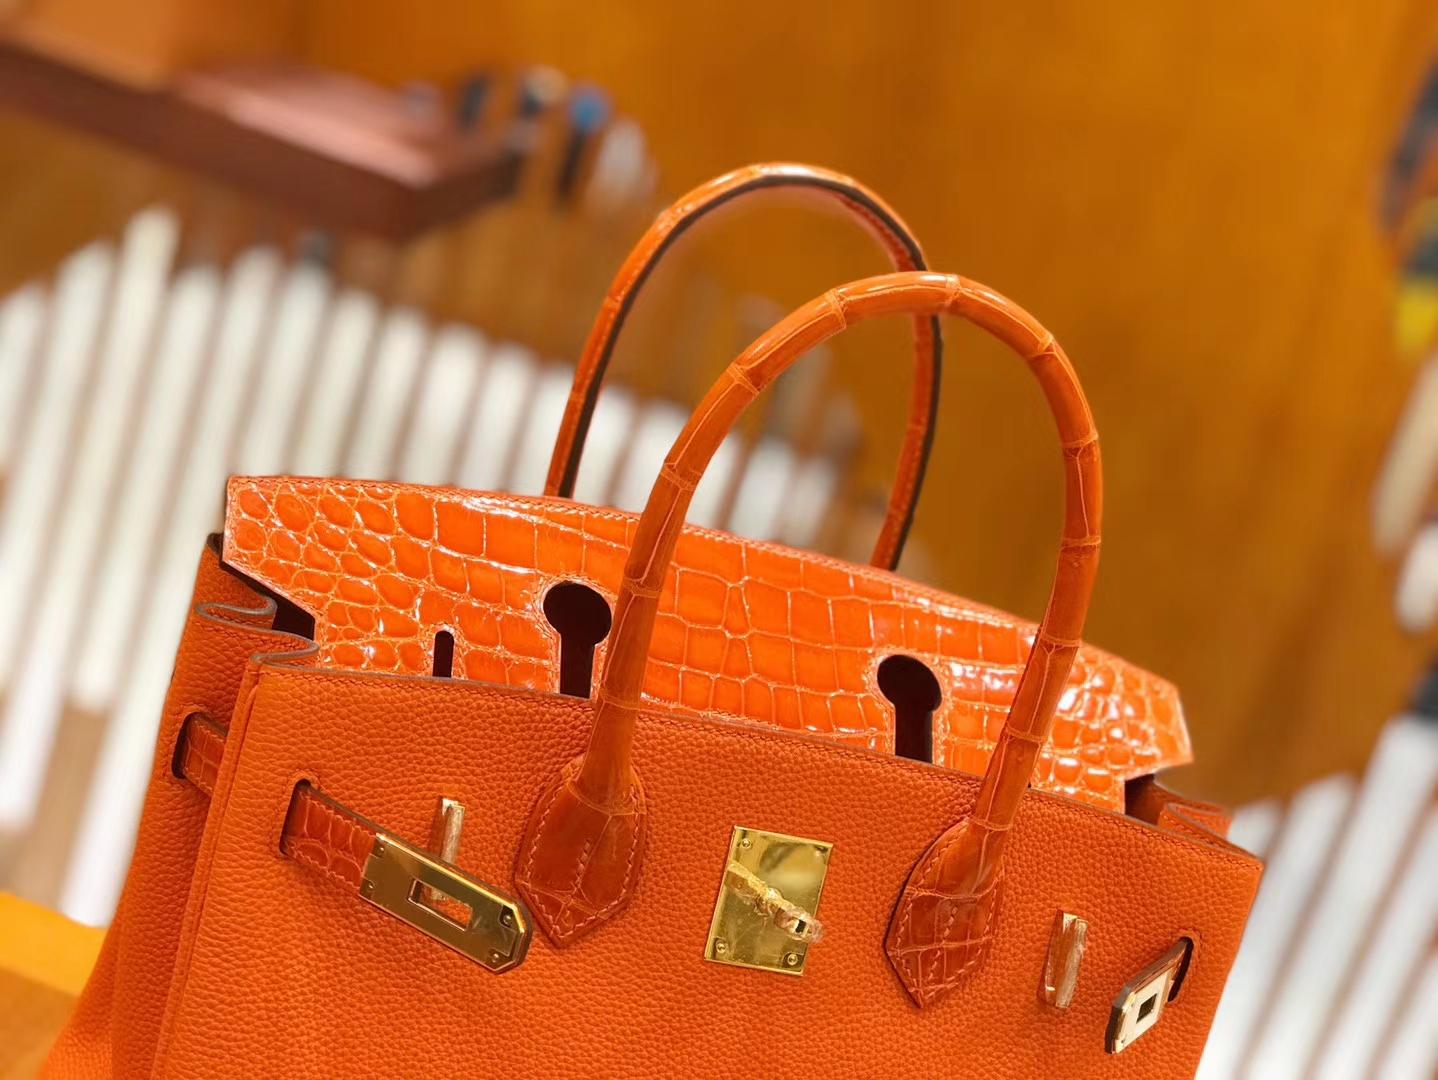 Hermès(爱马仕)Birkin 30cm Touch 火焰橙 鳄鱼皮拼牛皮 全手工缝制